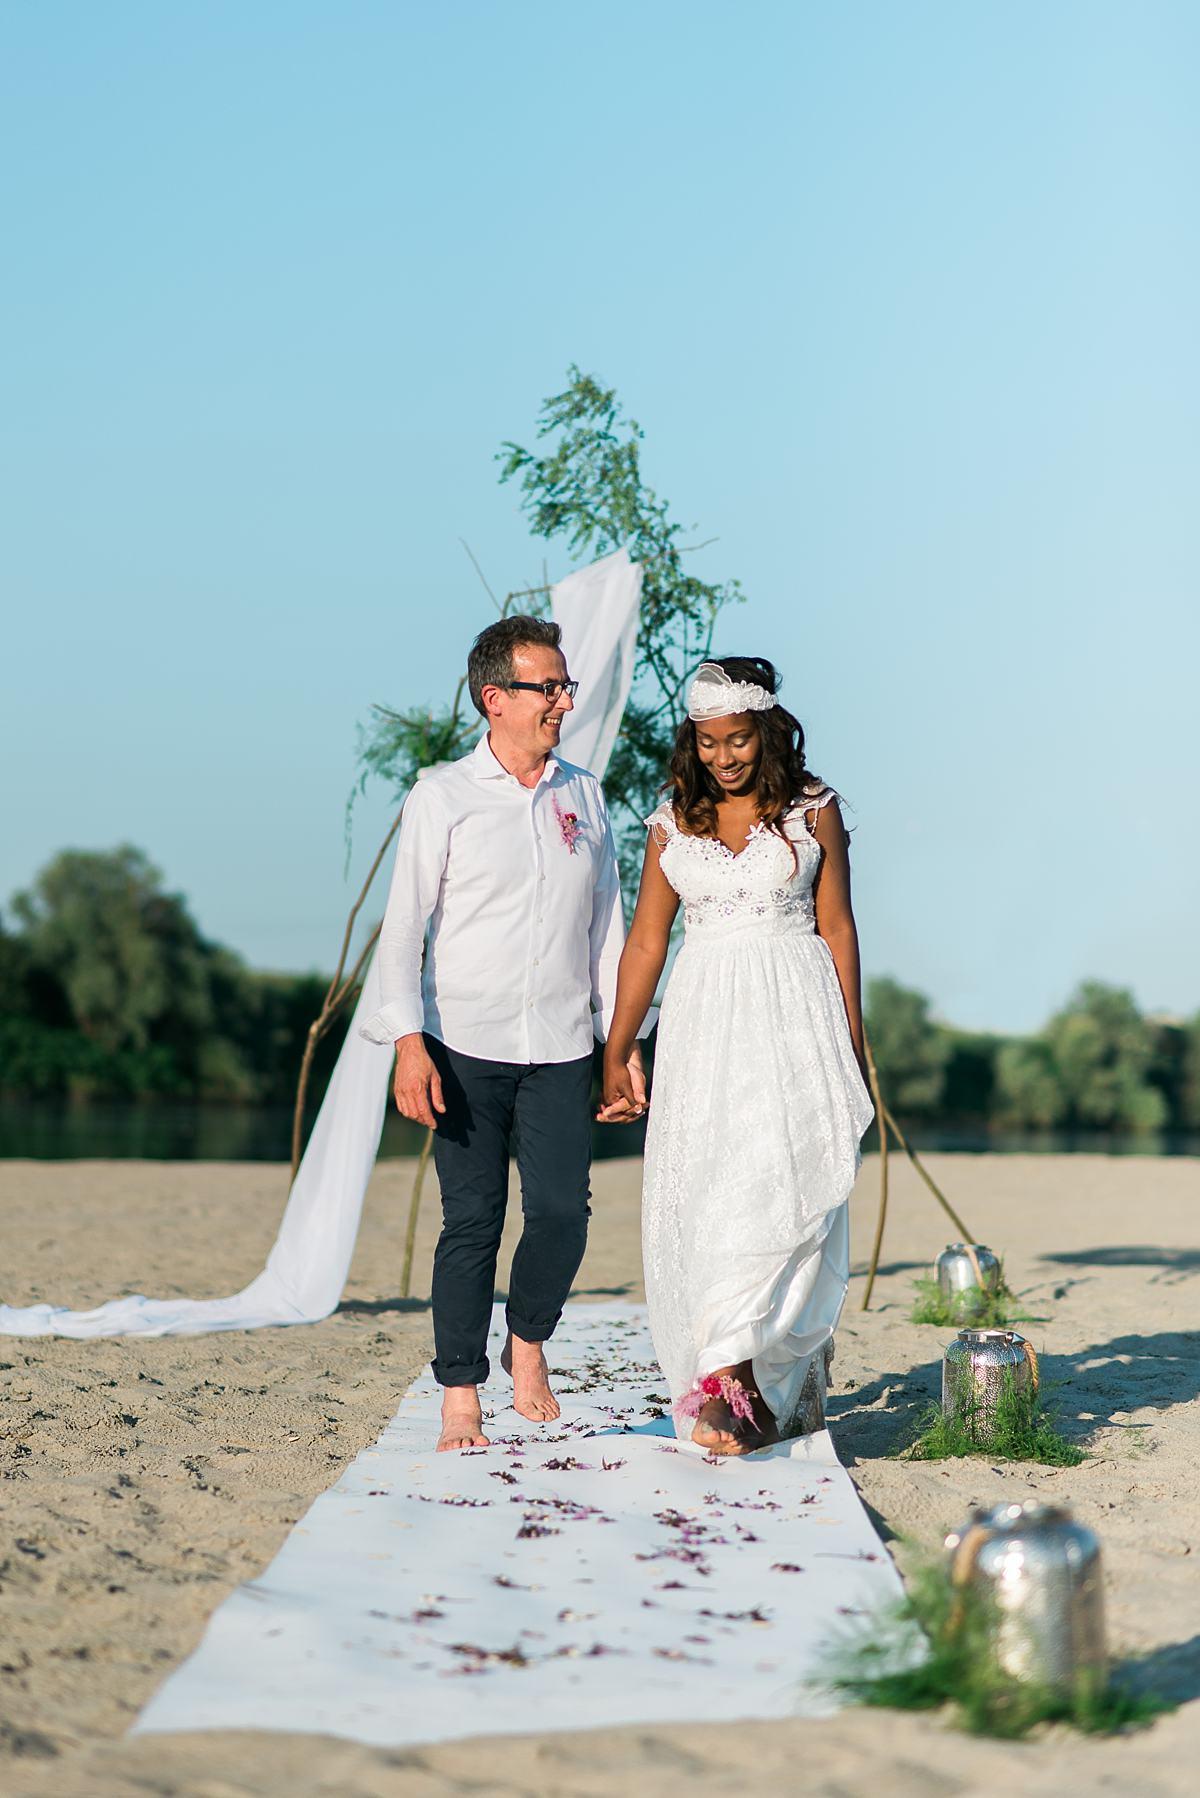 wedding-inspiration-on-the-beach_1553